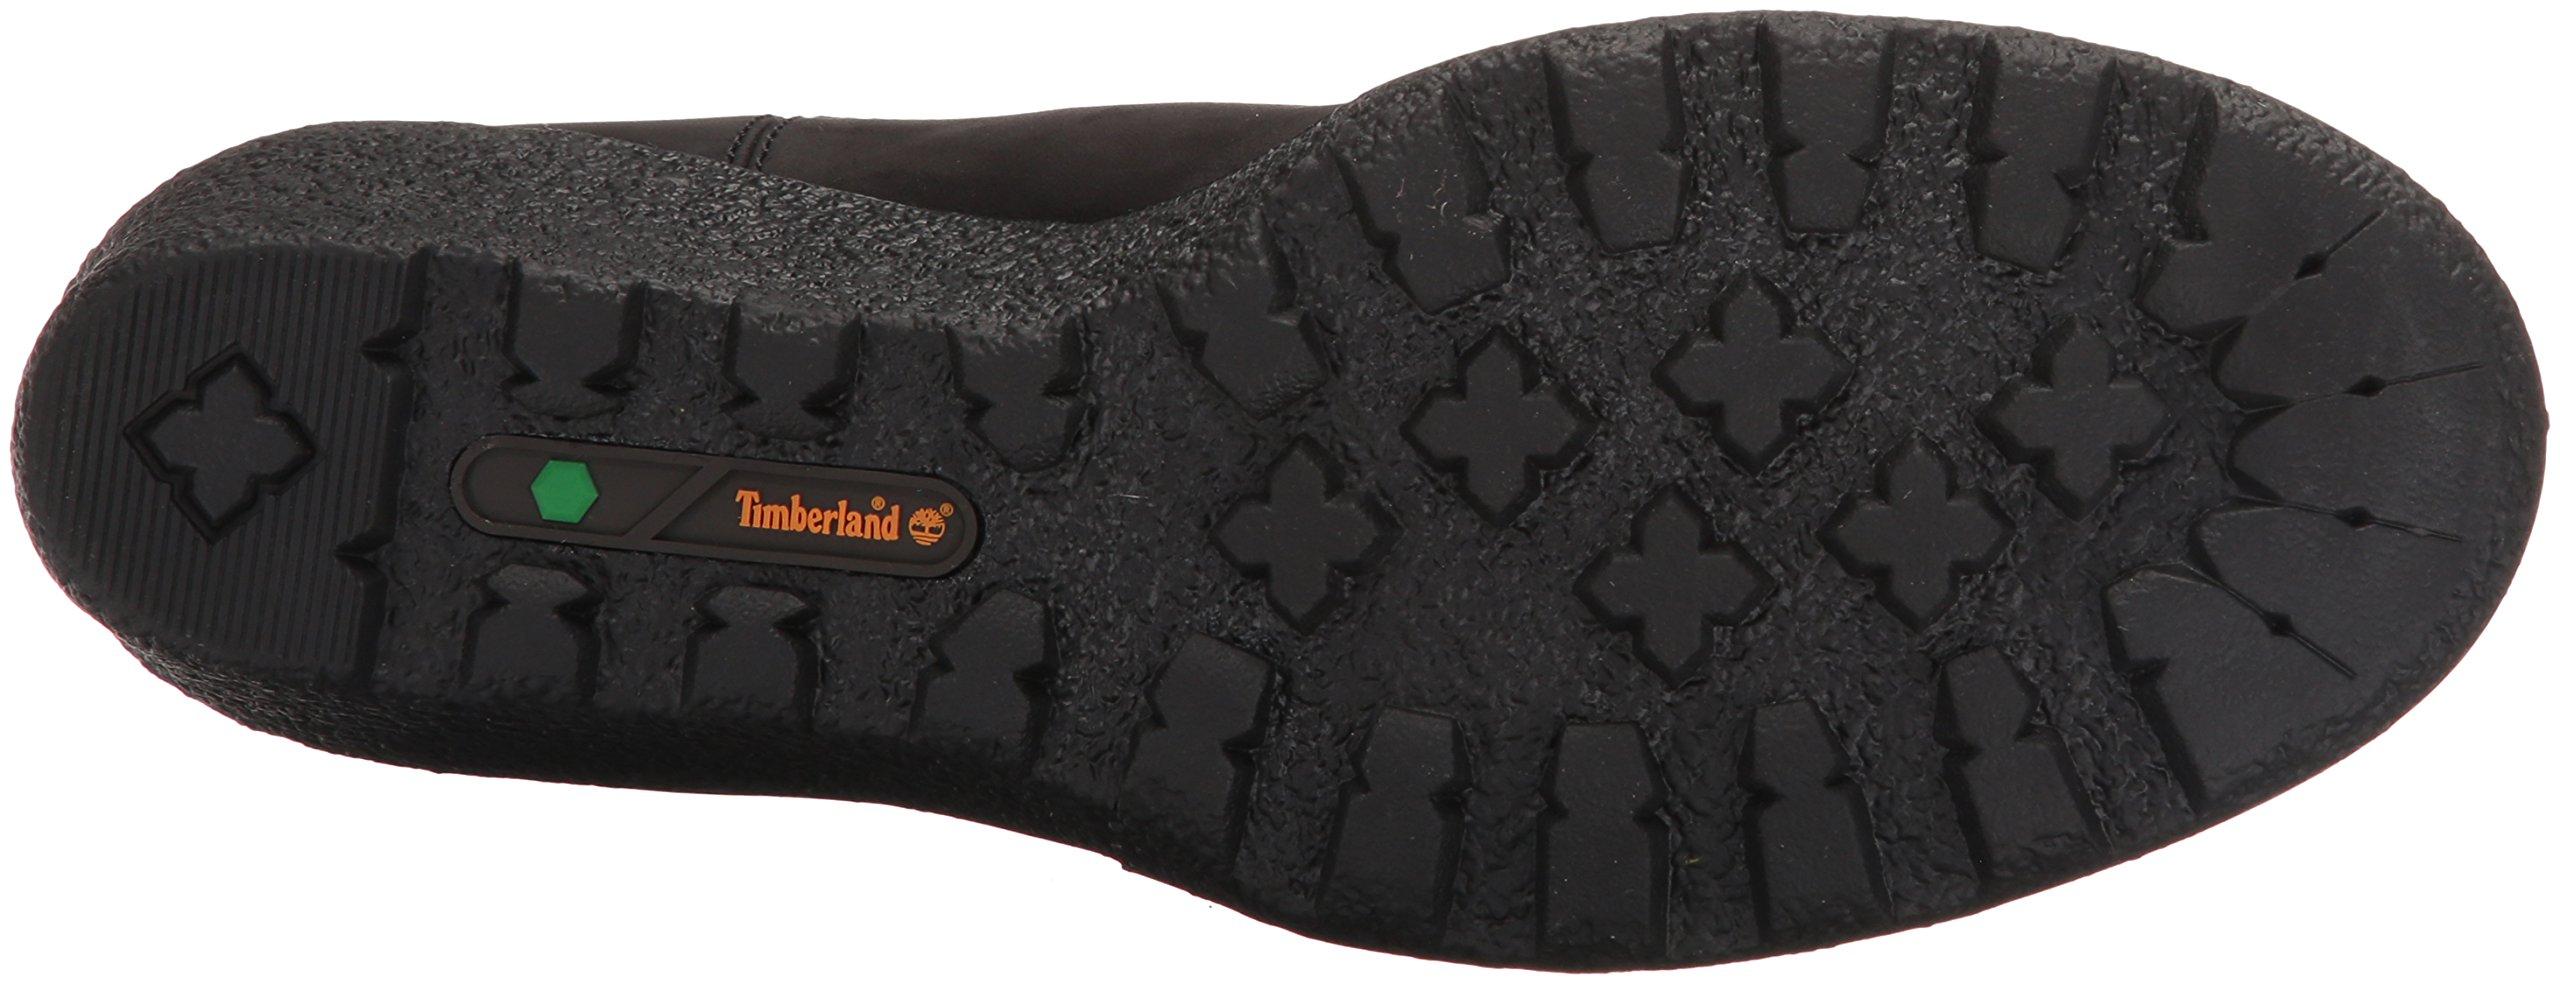 Timberland Women's Amston Chelsea Boot,Black Nubuck,9 M US by Timberland (Image #3)